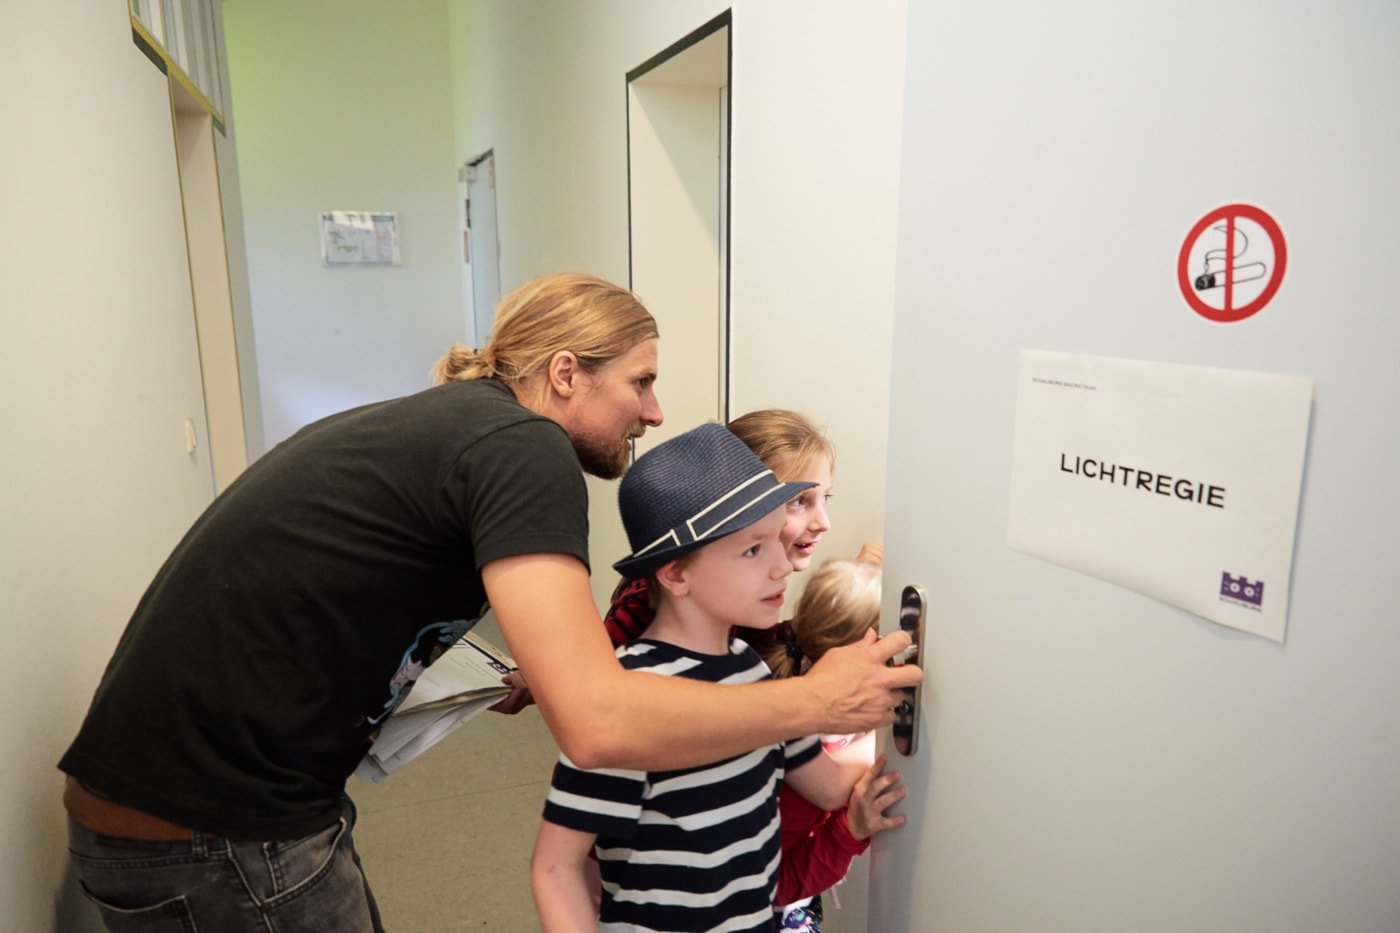 Theaterfest Schauburg Kinder Hinter den Kulissen // HIMBEER